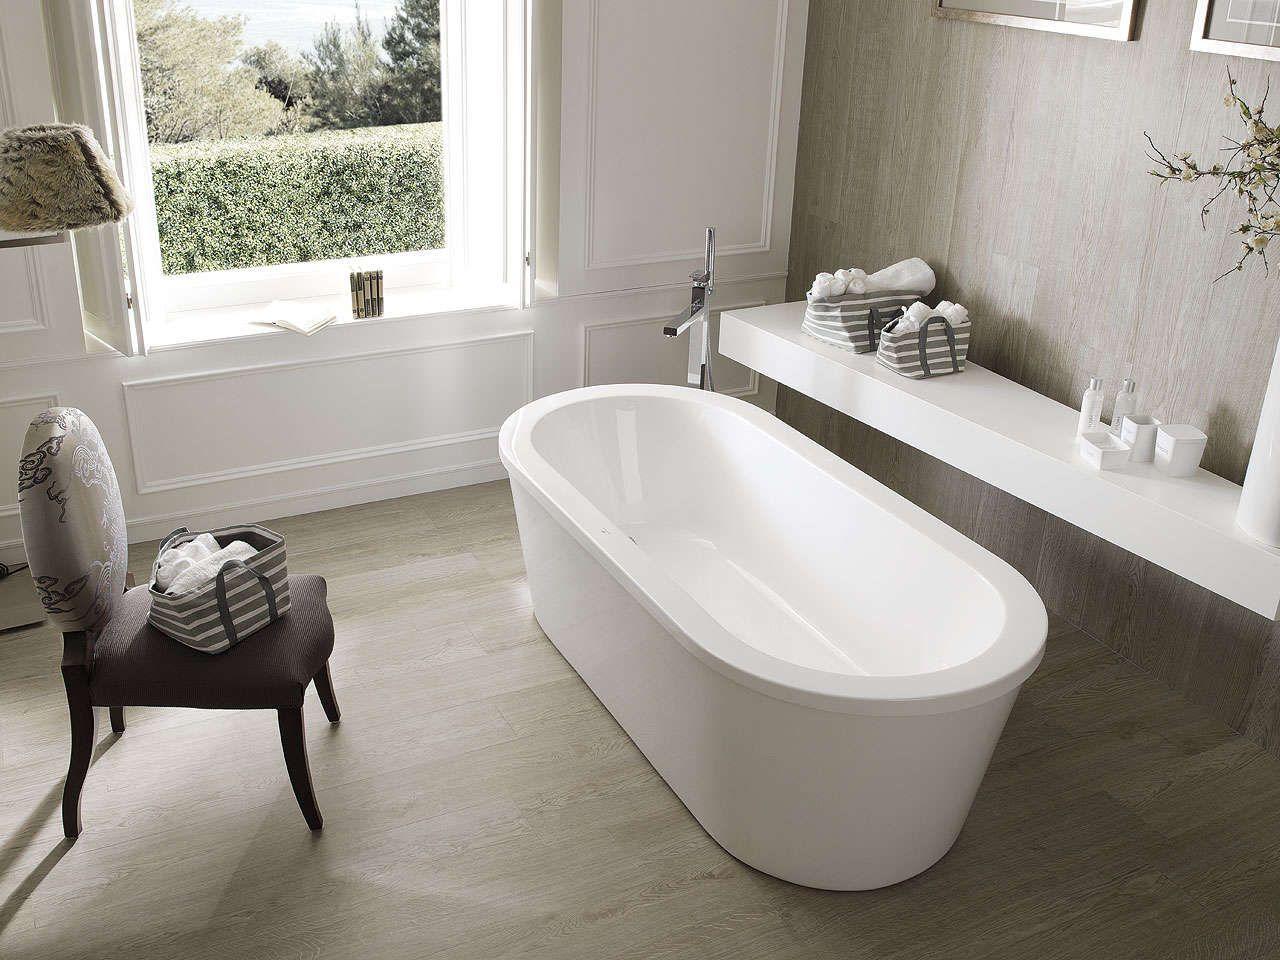 porcelanosa bathrooms - - Yahoo Image Search Results | beach bath ...